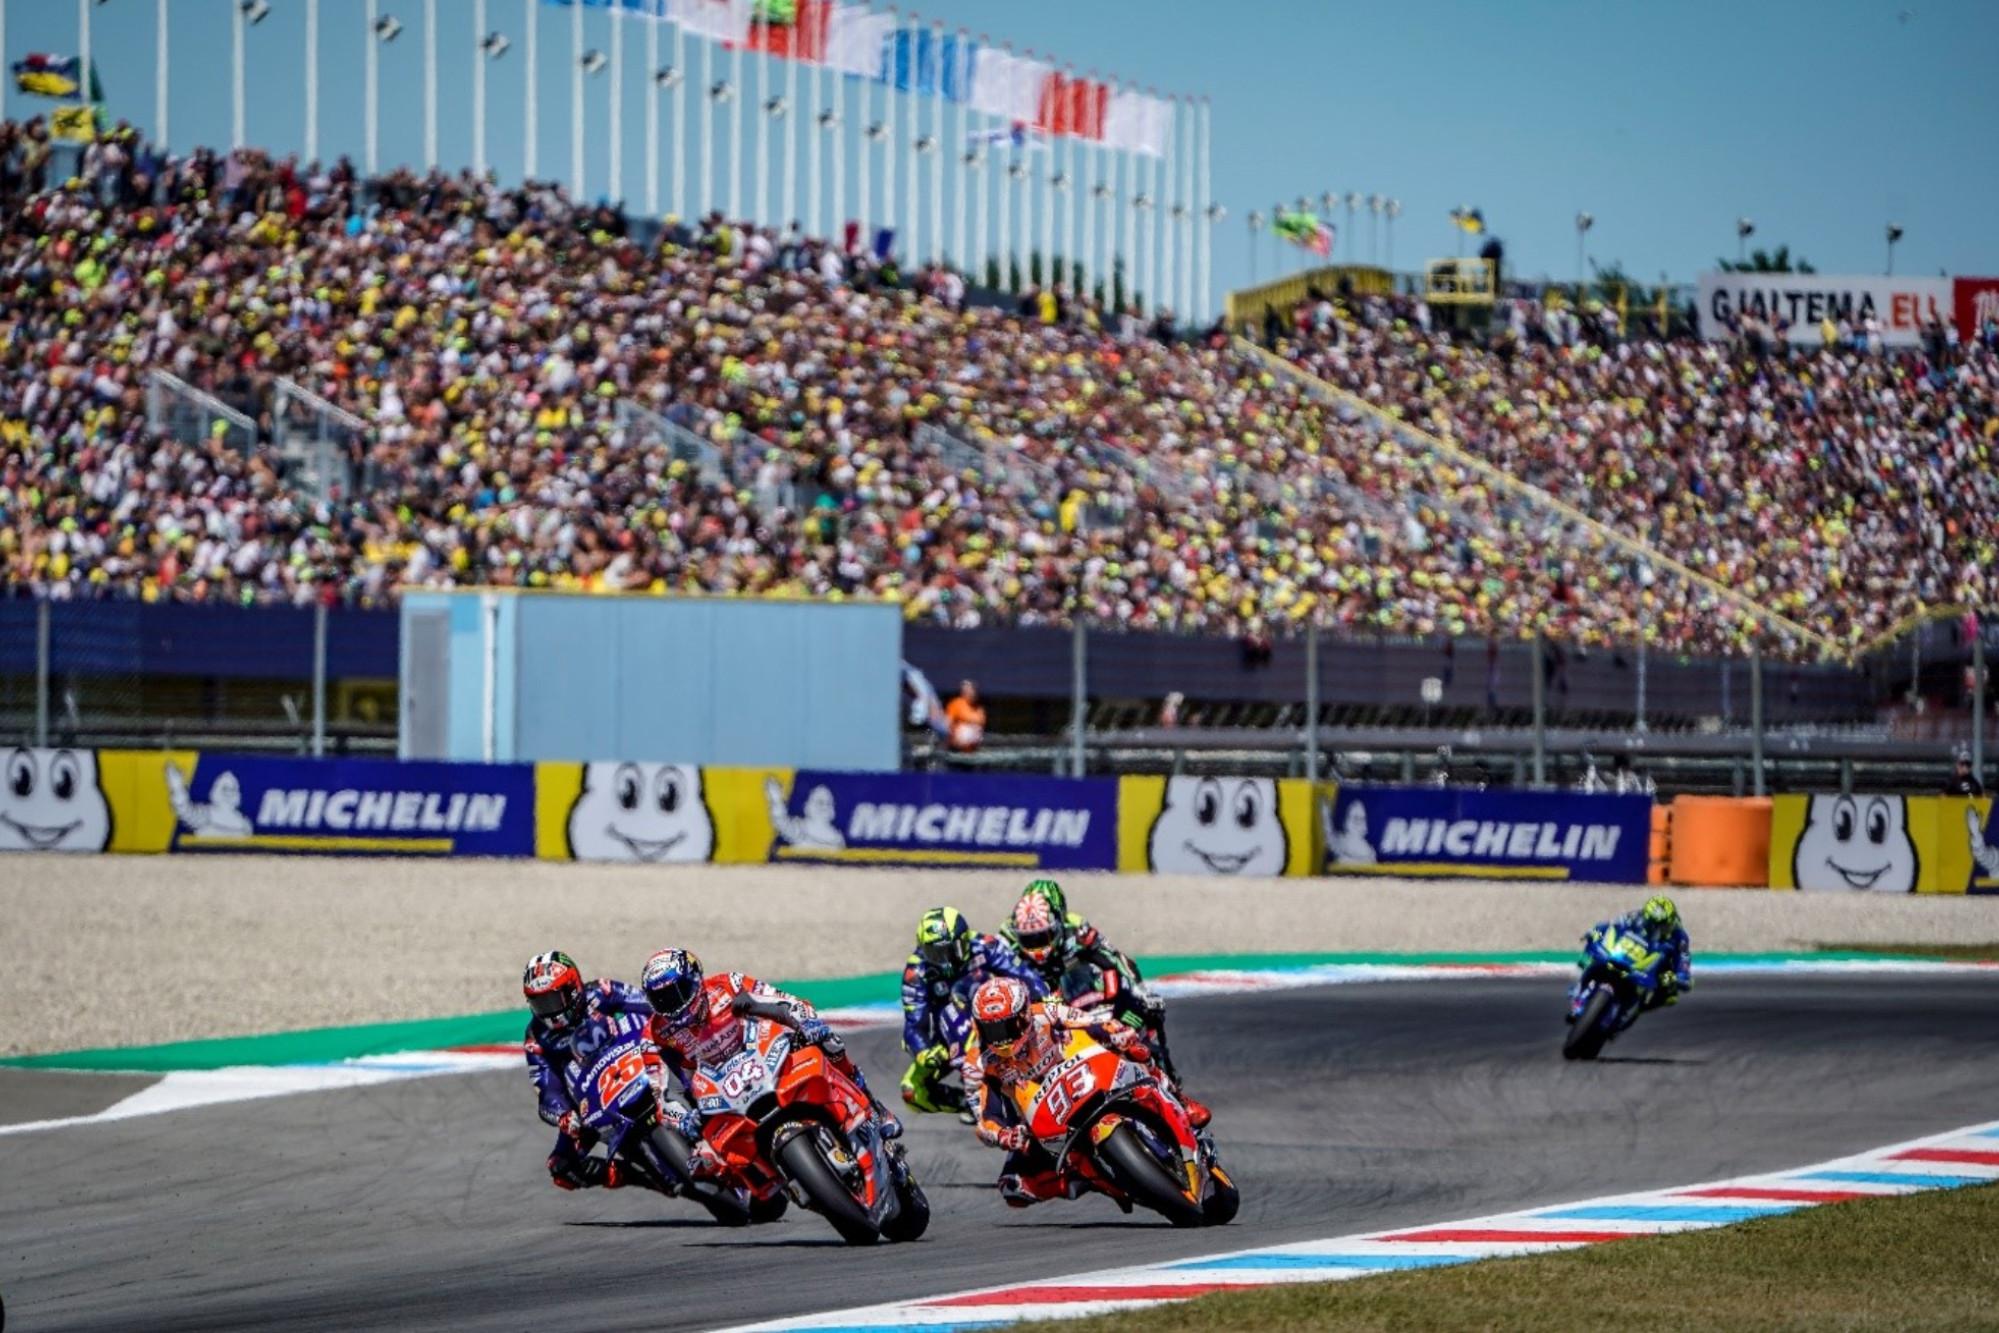 Assen MotoGP 2018